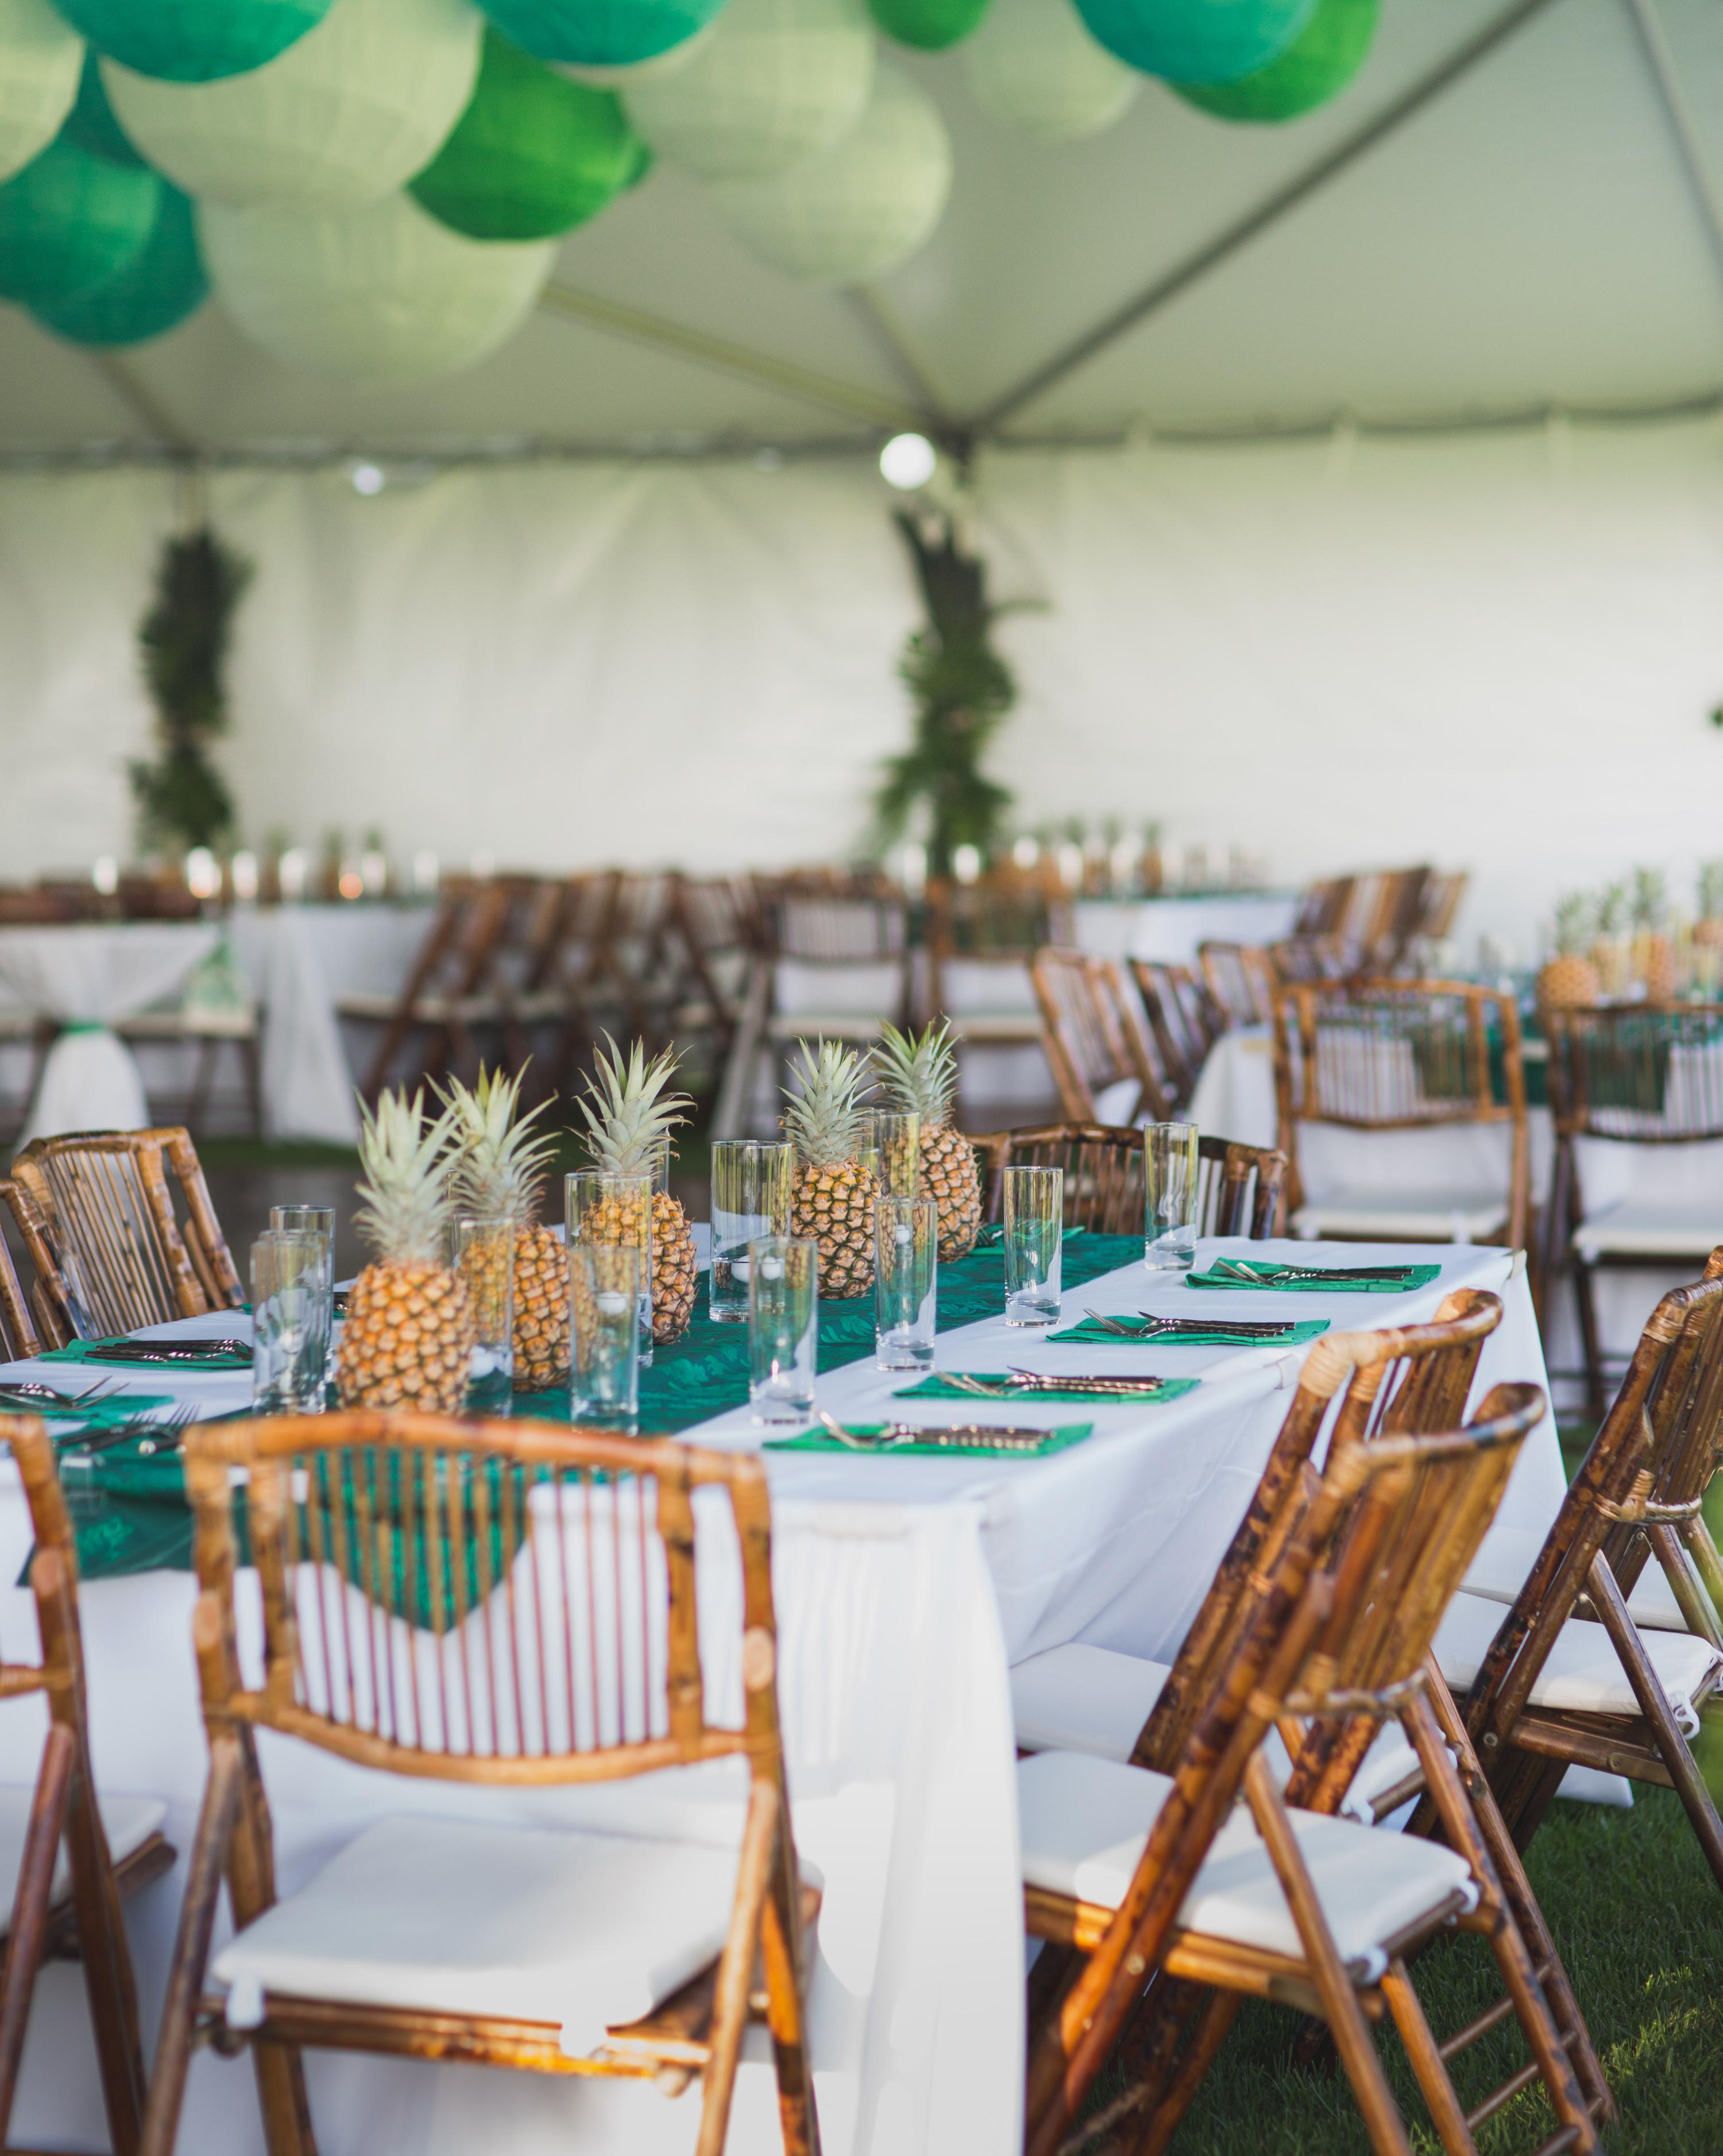 maddie-tony-wedding-reception-7467-s112424-1015.jpg